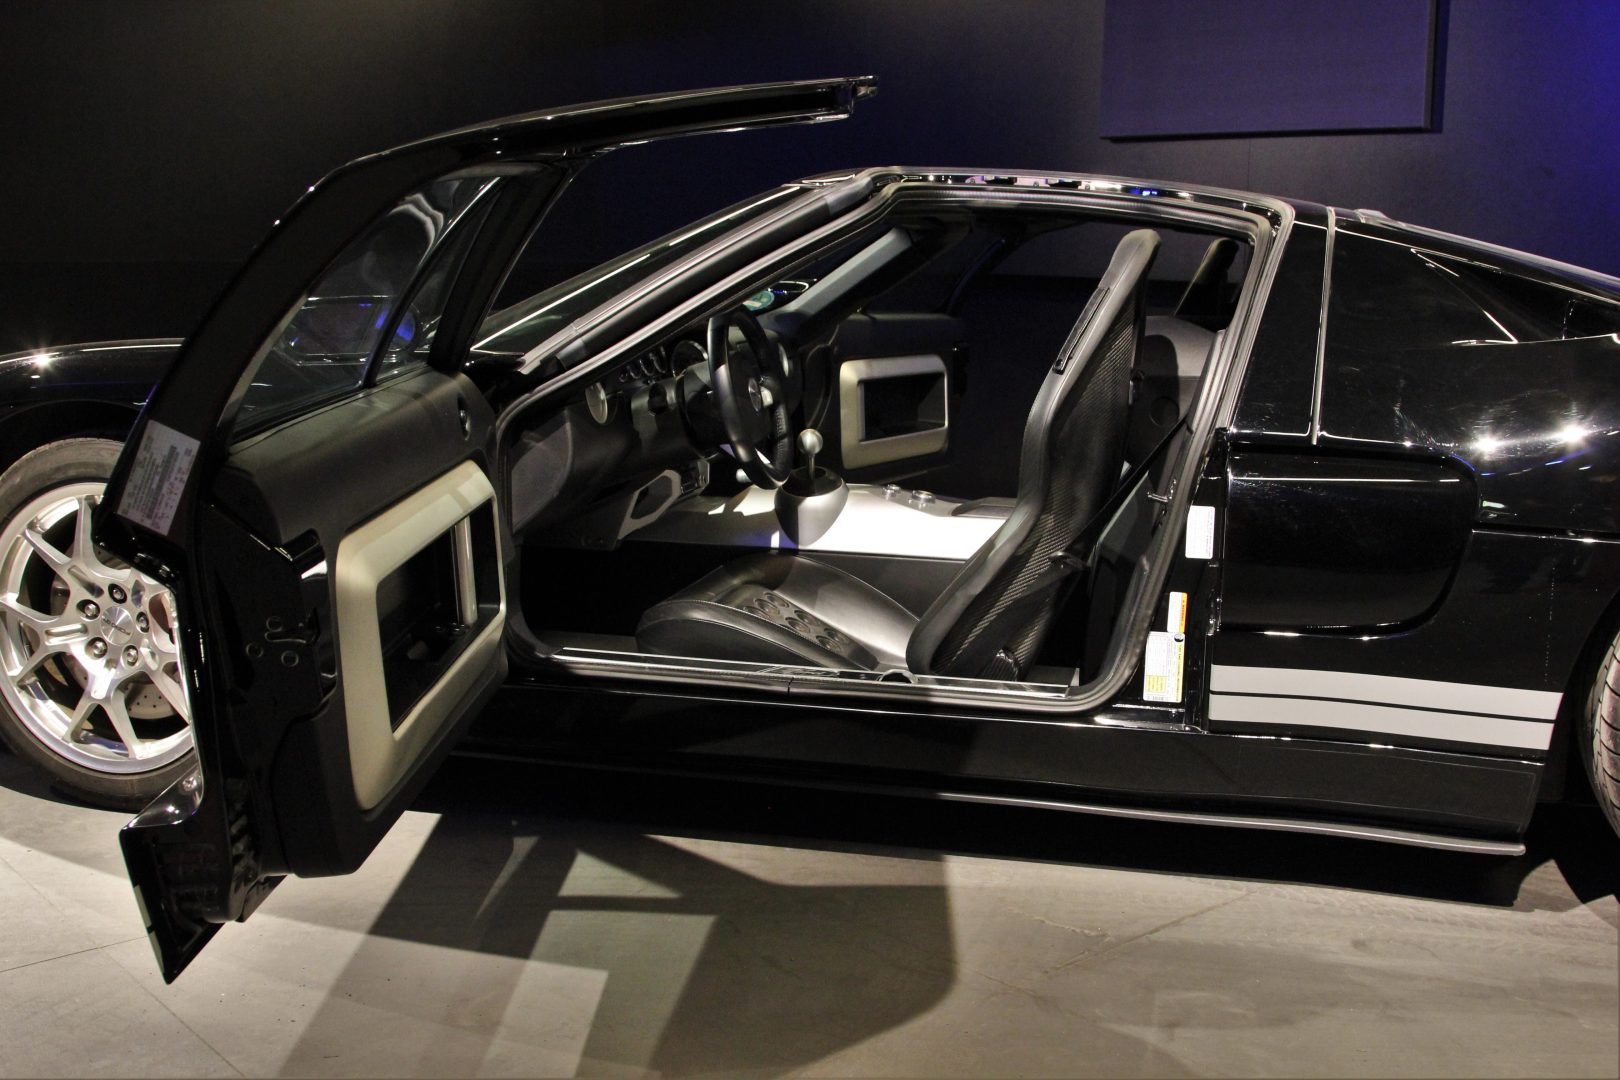 AIL Ford GT 5.4L V8 Supercharger 9